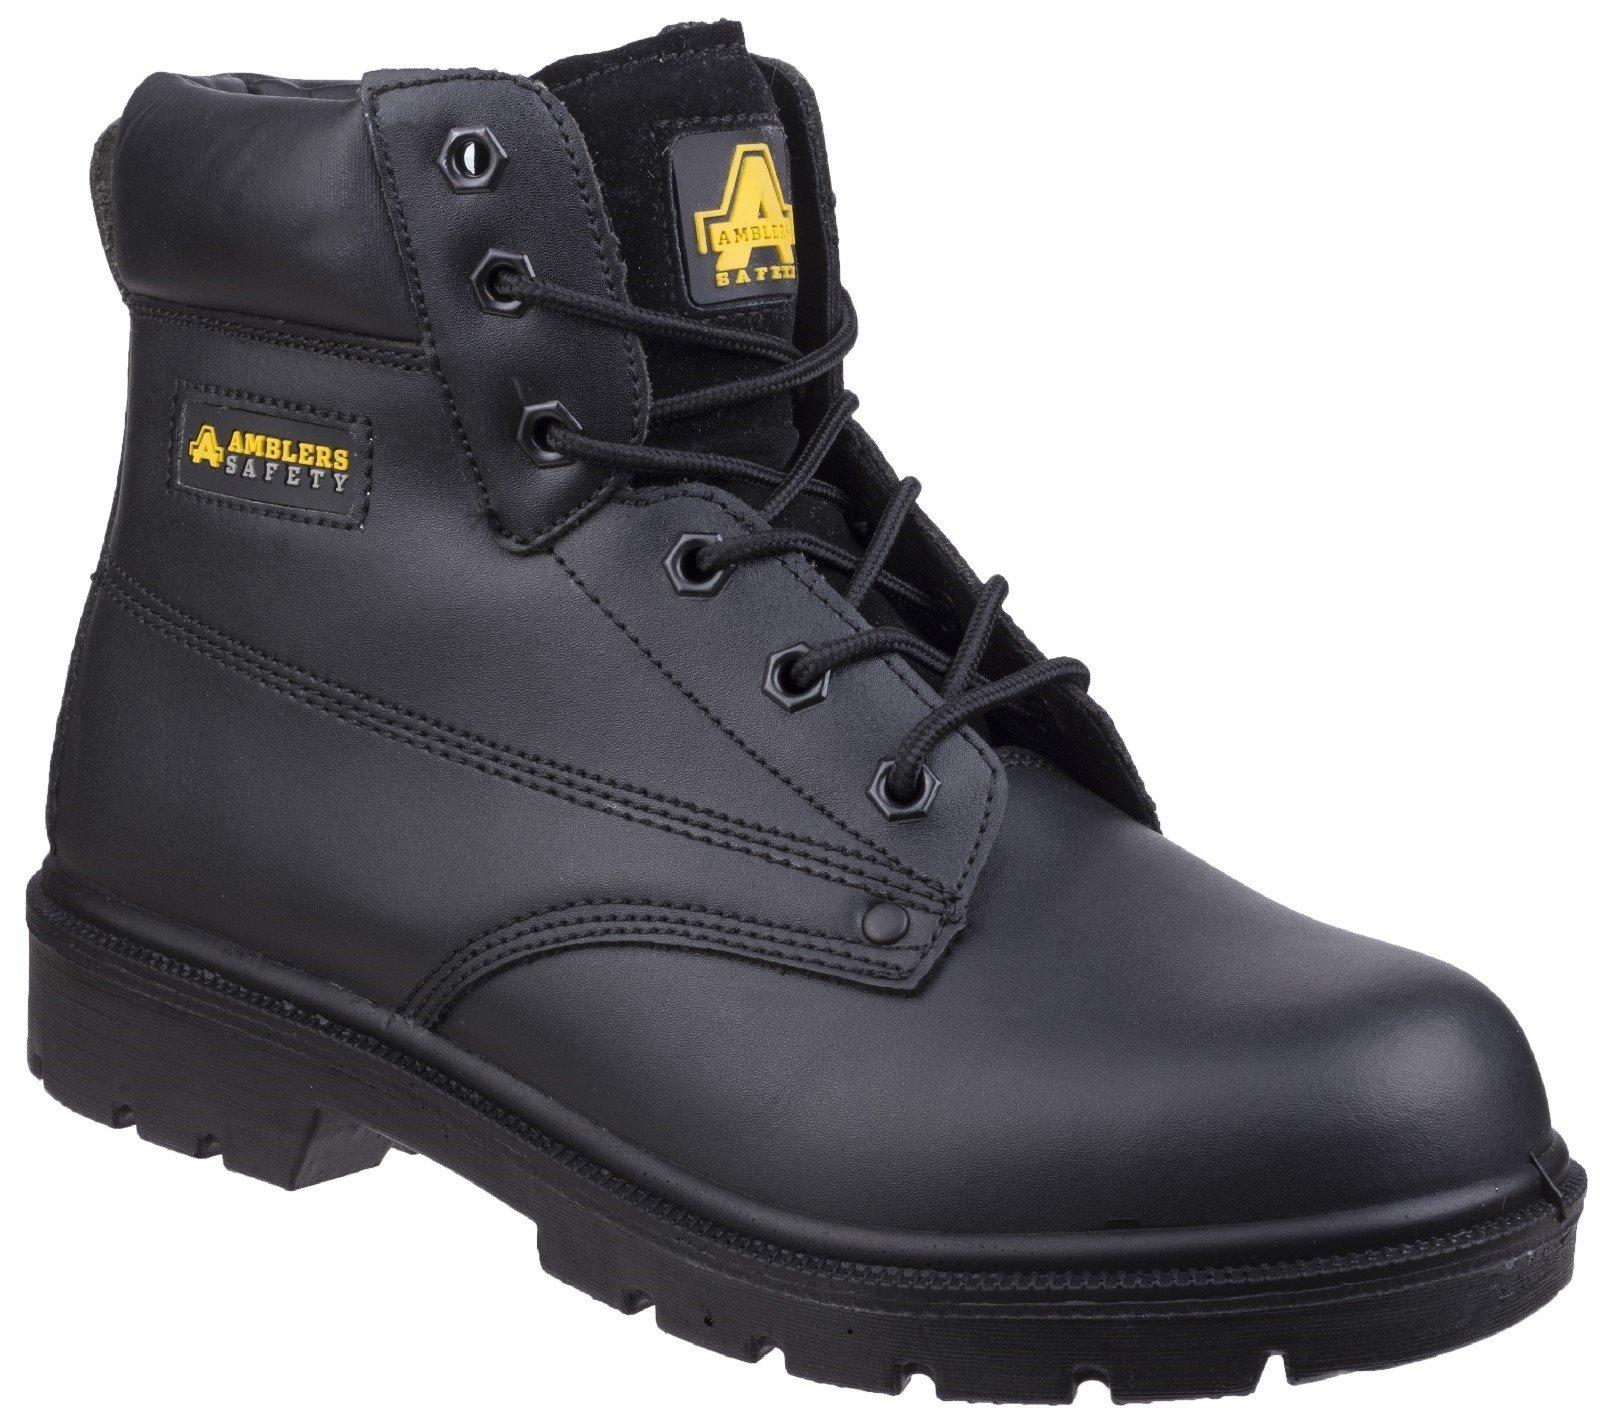 Amblers Unisex Safety S3 Boot Black 24864 - Black 4